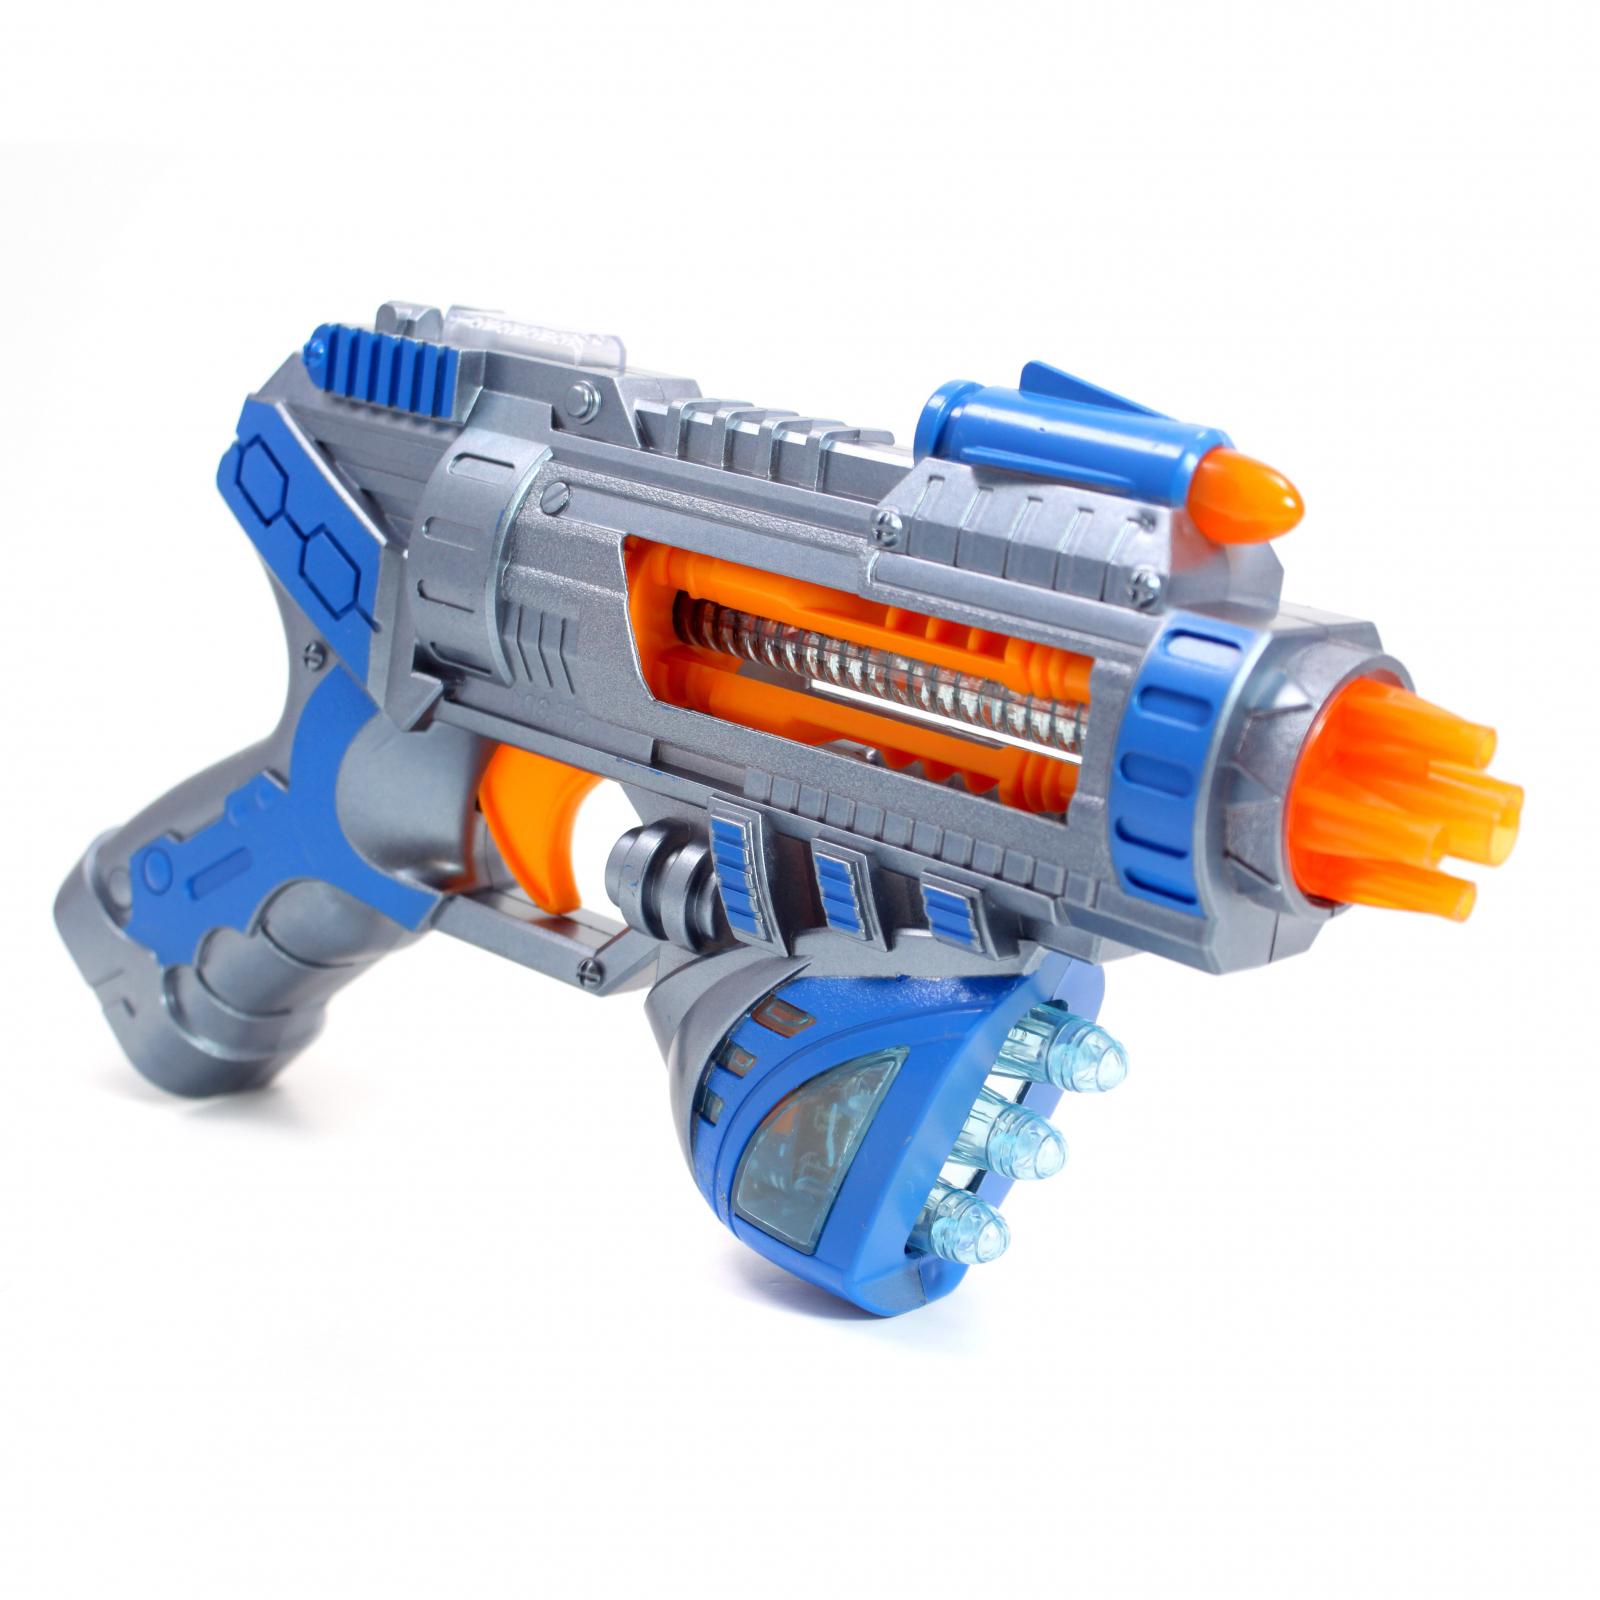 Kidplokio Superhero Galaxy Space Sonic Blaster Toy Gun Blue